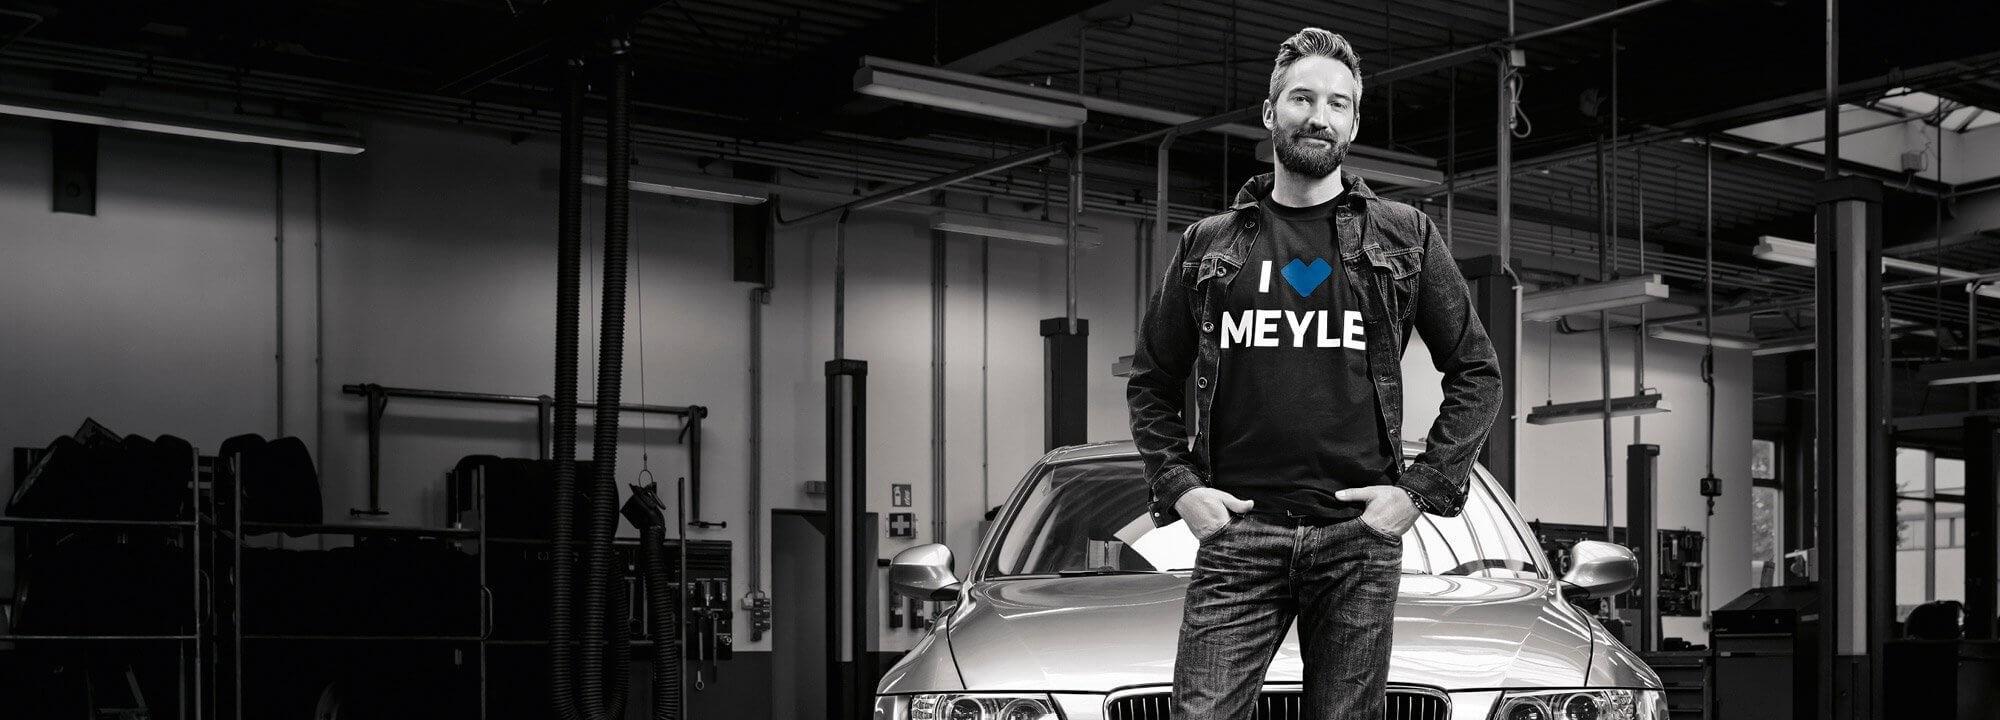 Торговая марка Meyle